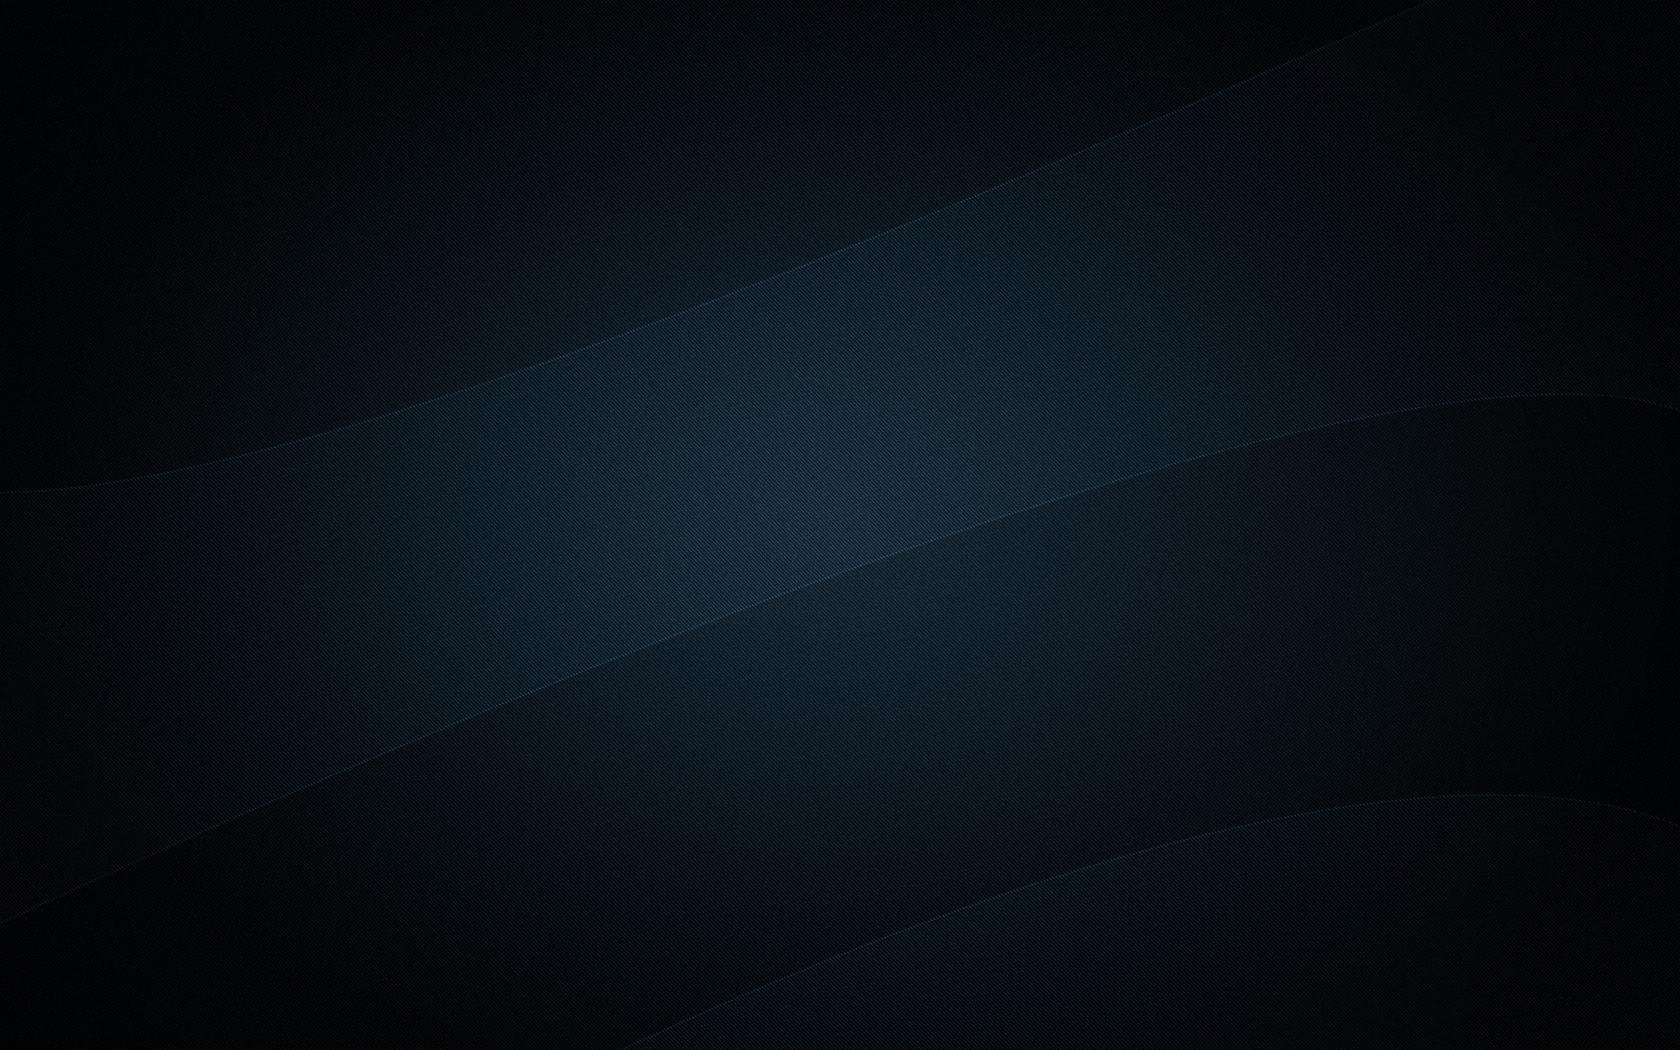 Navy Swirlies Wallpapers Navy Swirlies Myspace Backgrounds Navy 1680x1050